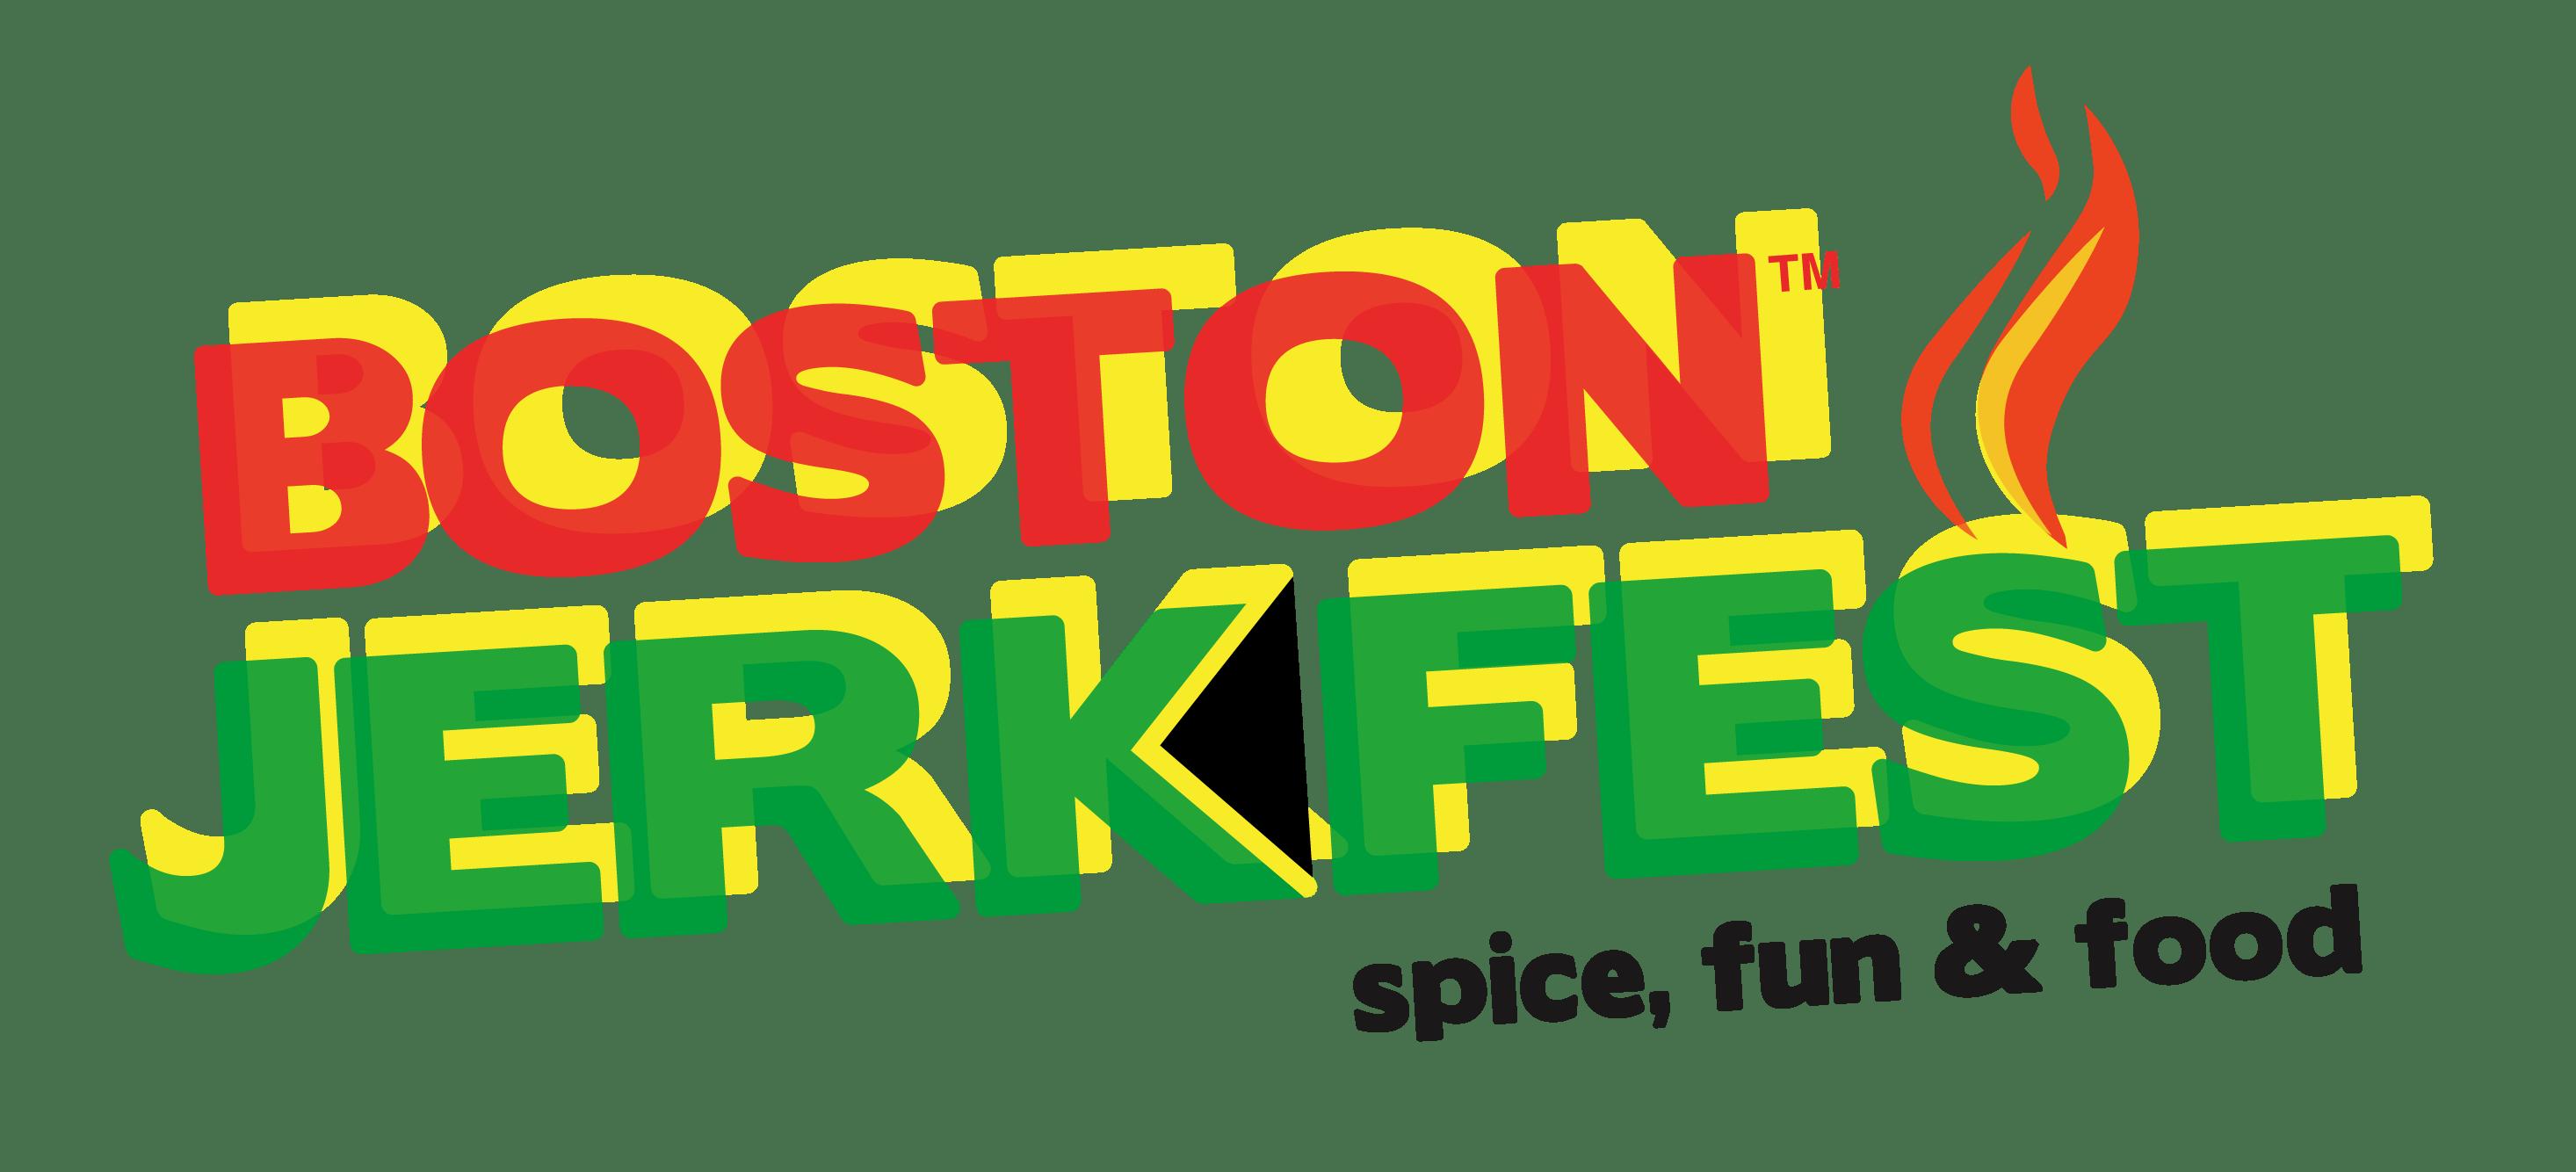 6th Boston JerkFest Caribbean Foodie Festival